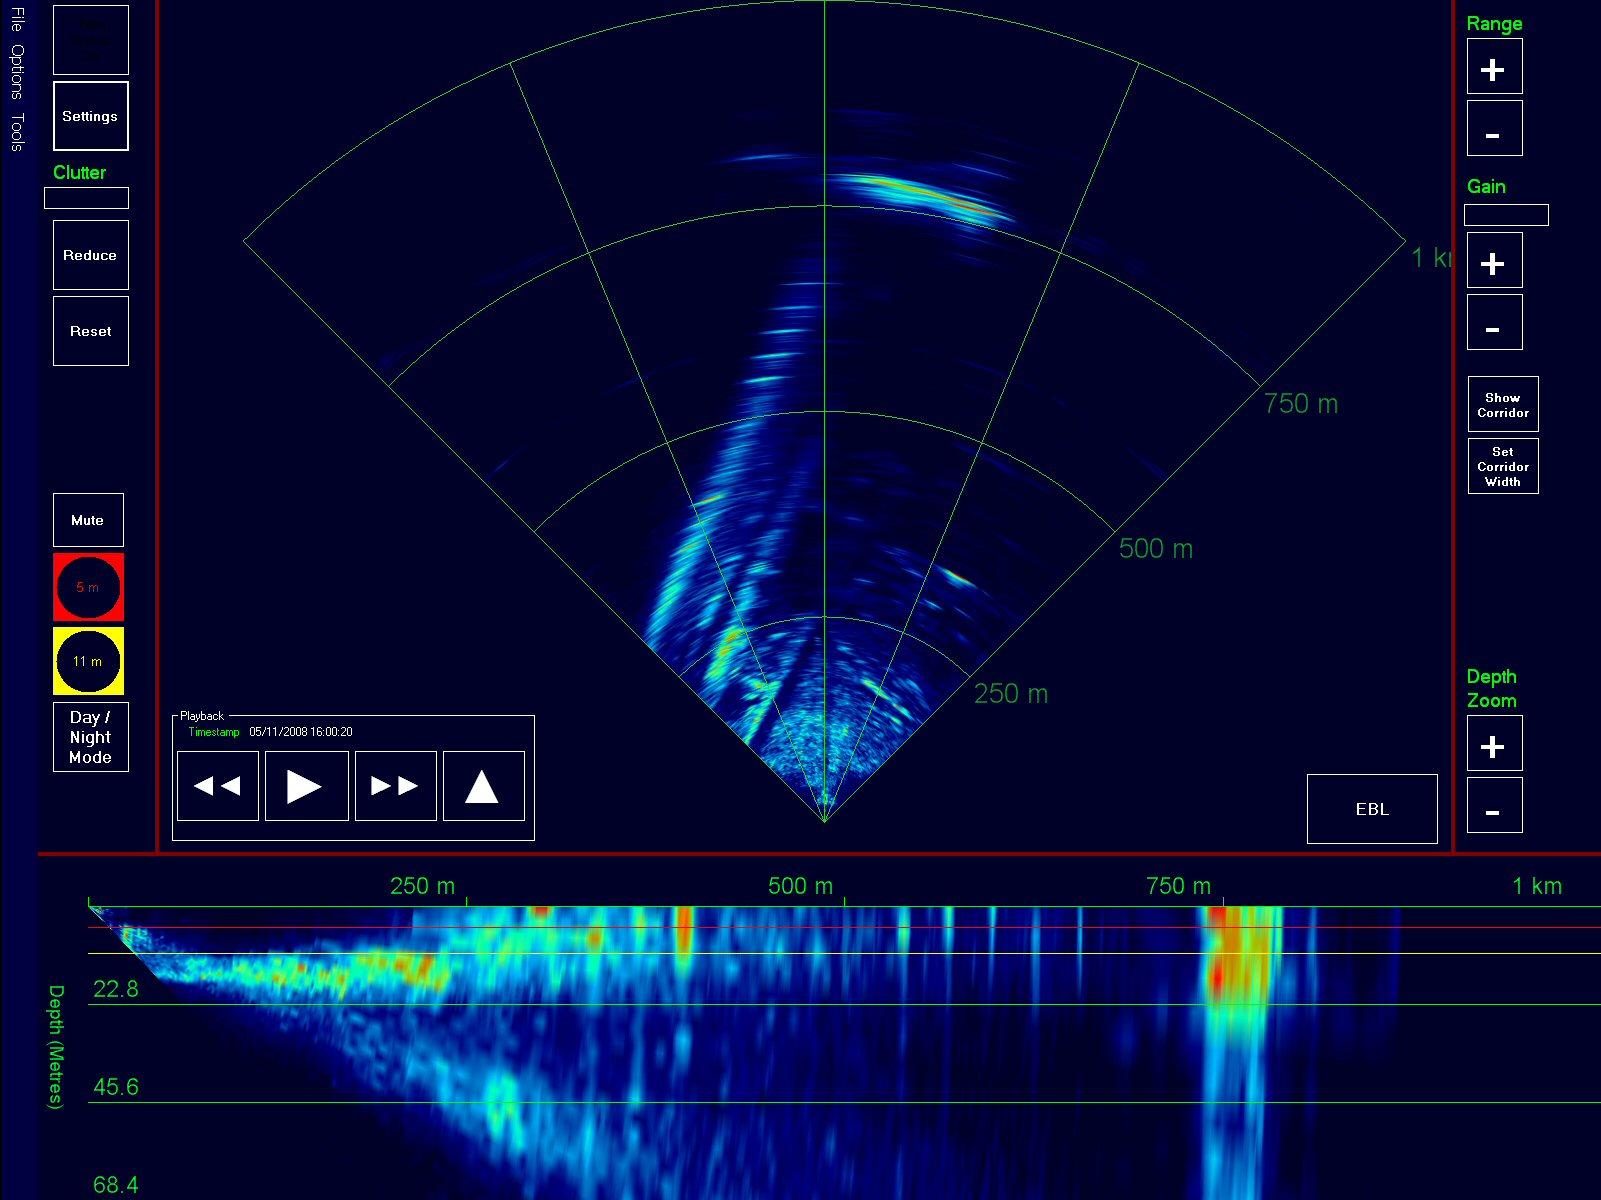 Marine Electronics Ltd See View 3d Imaging Sonar Model 3264